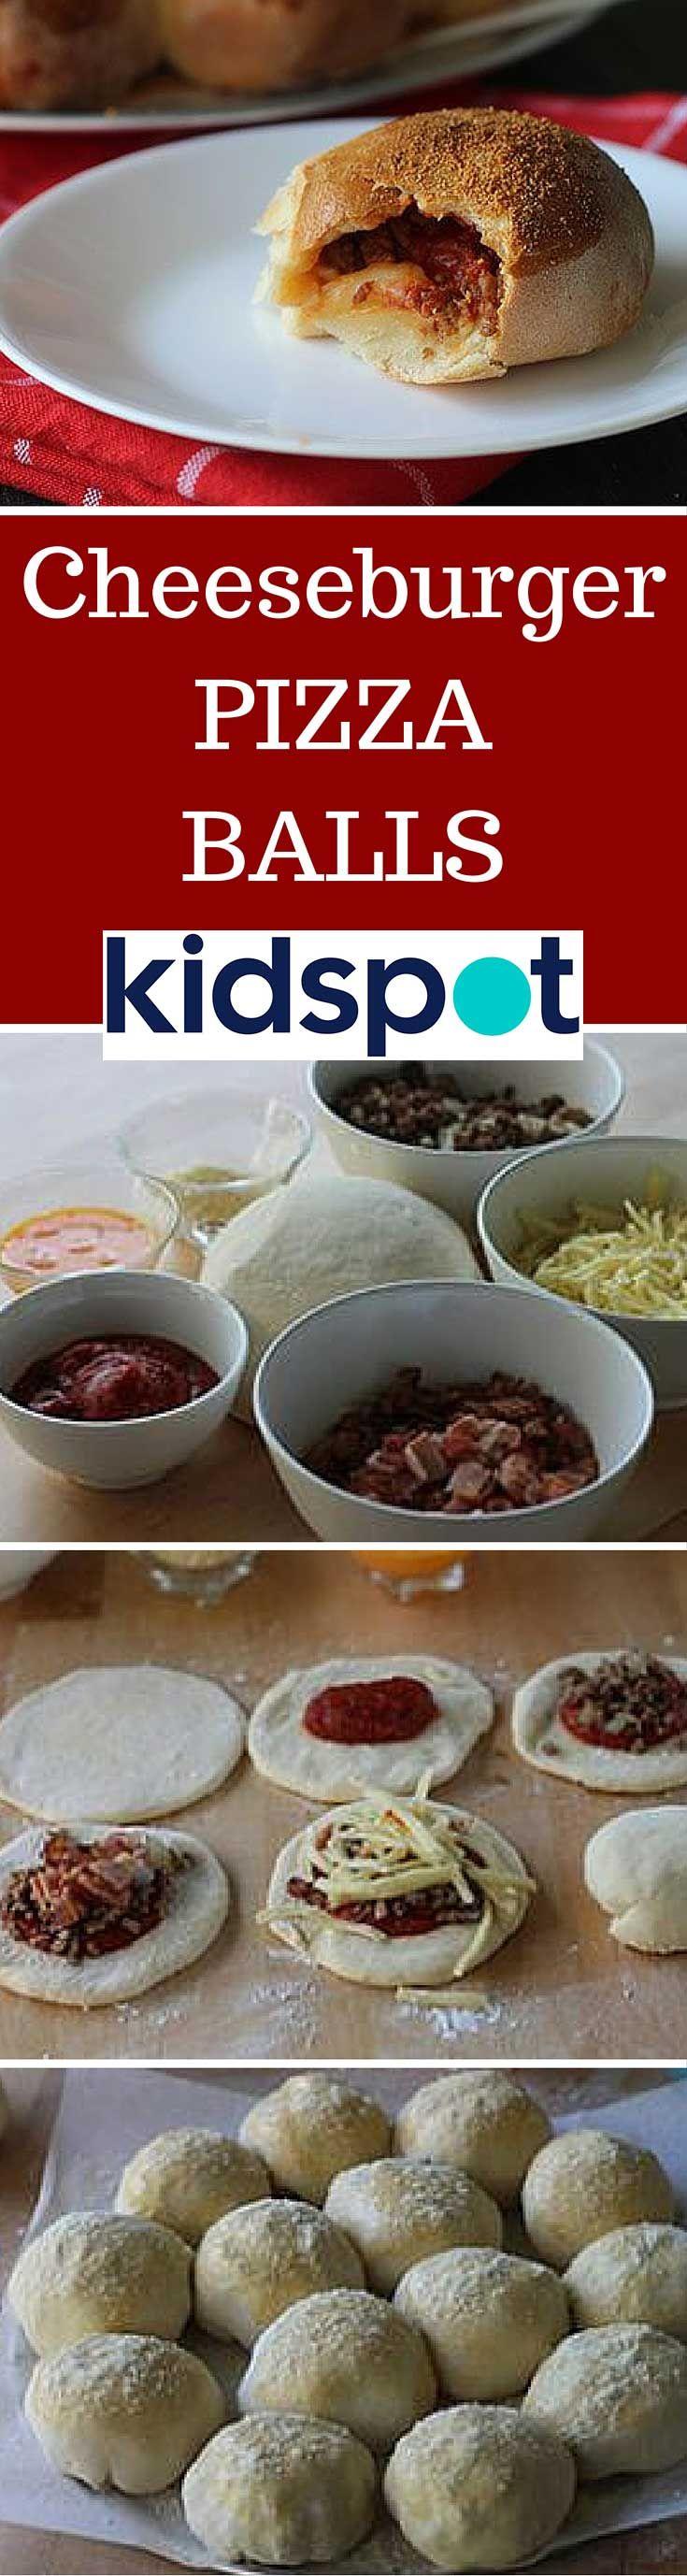 1915 best kidspot dinner inspirations images on pinterest bacon cheeseburger pizza balls kidspot recipeskid forumfinder Gallery